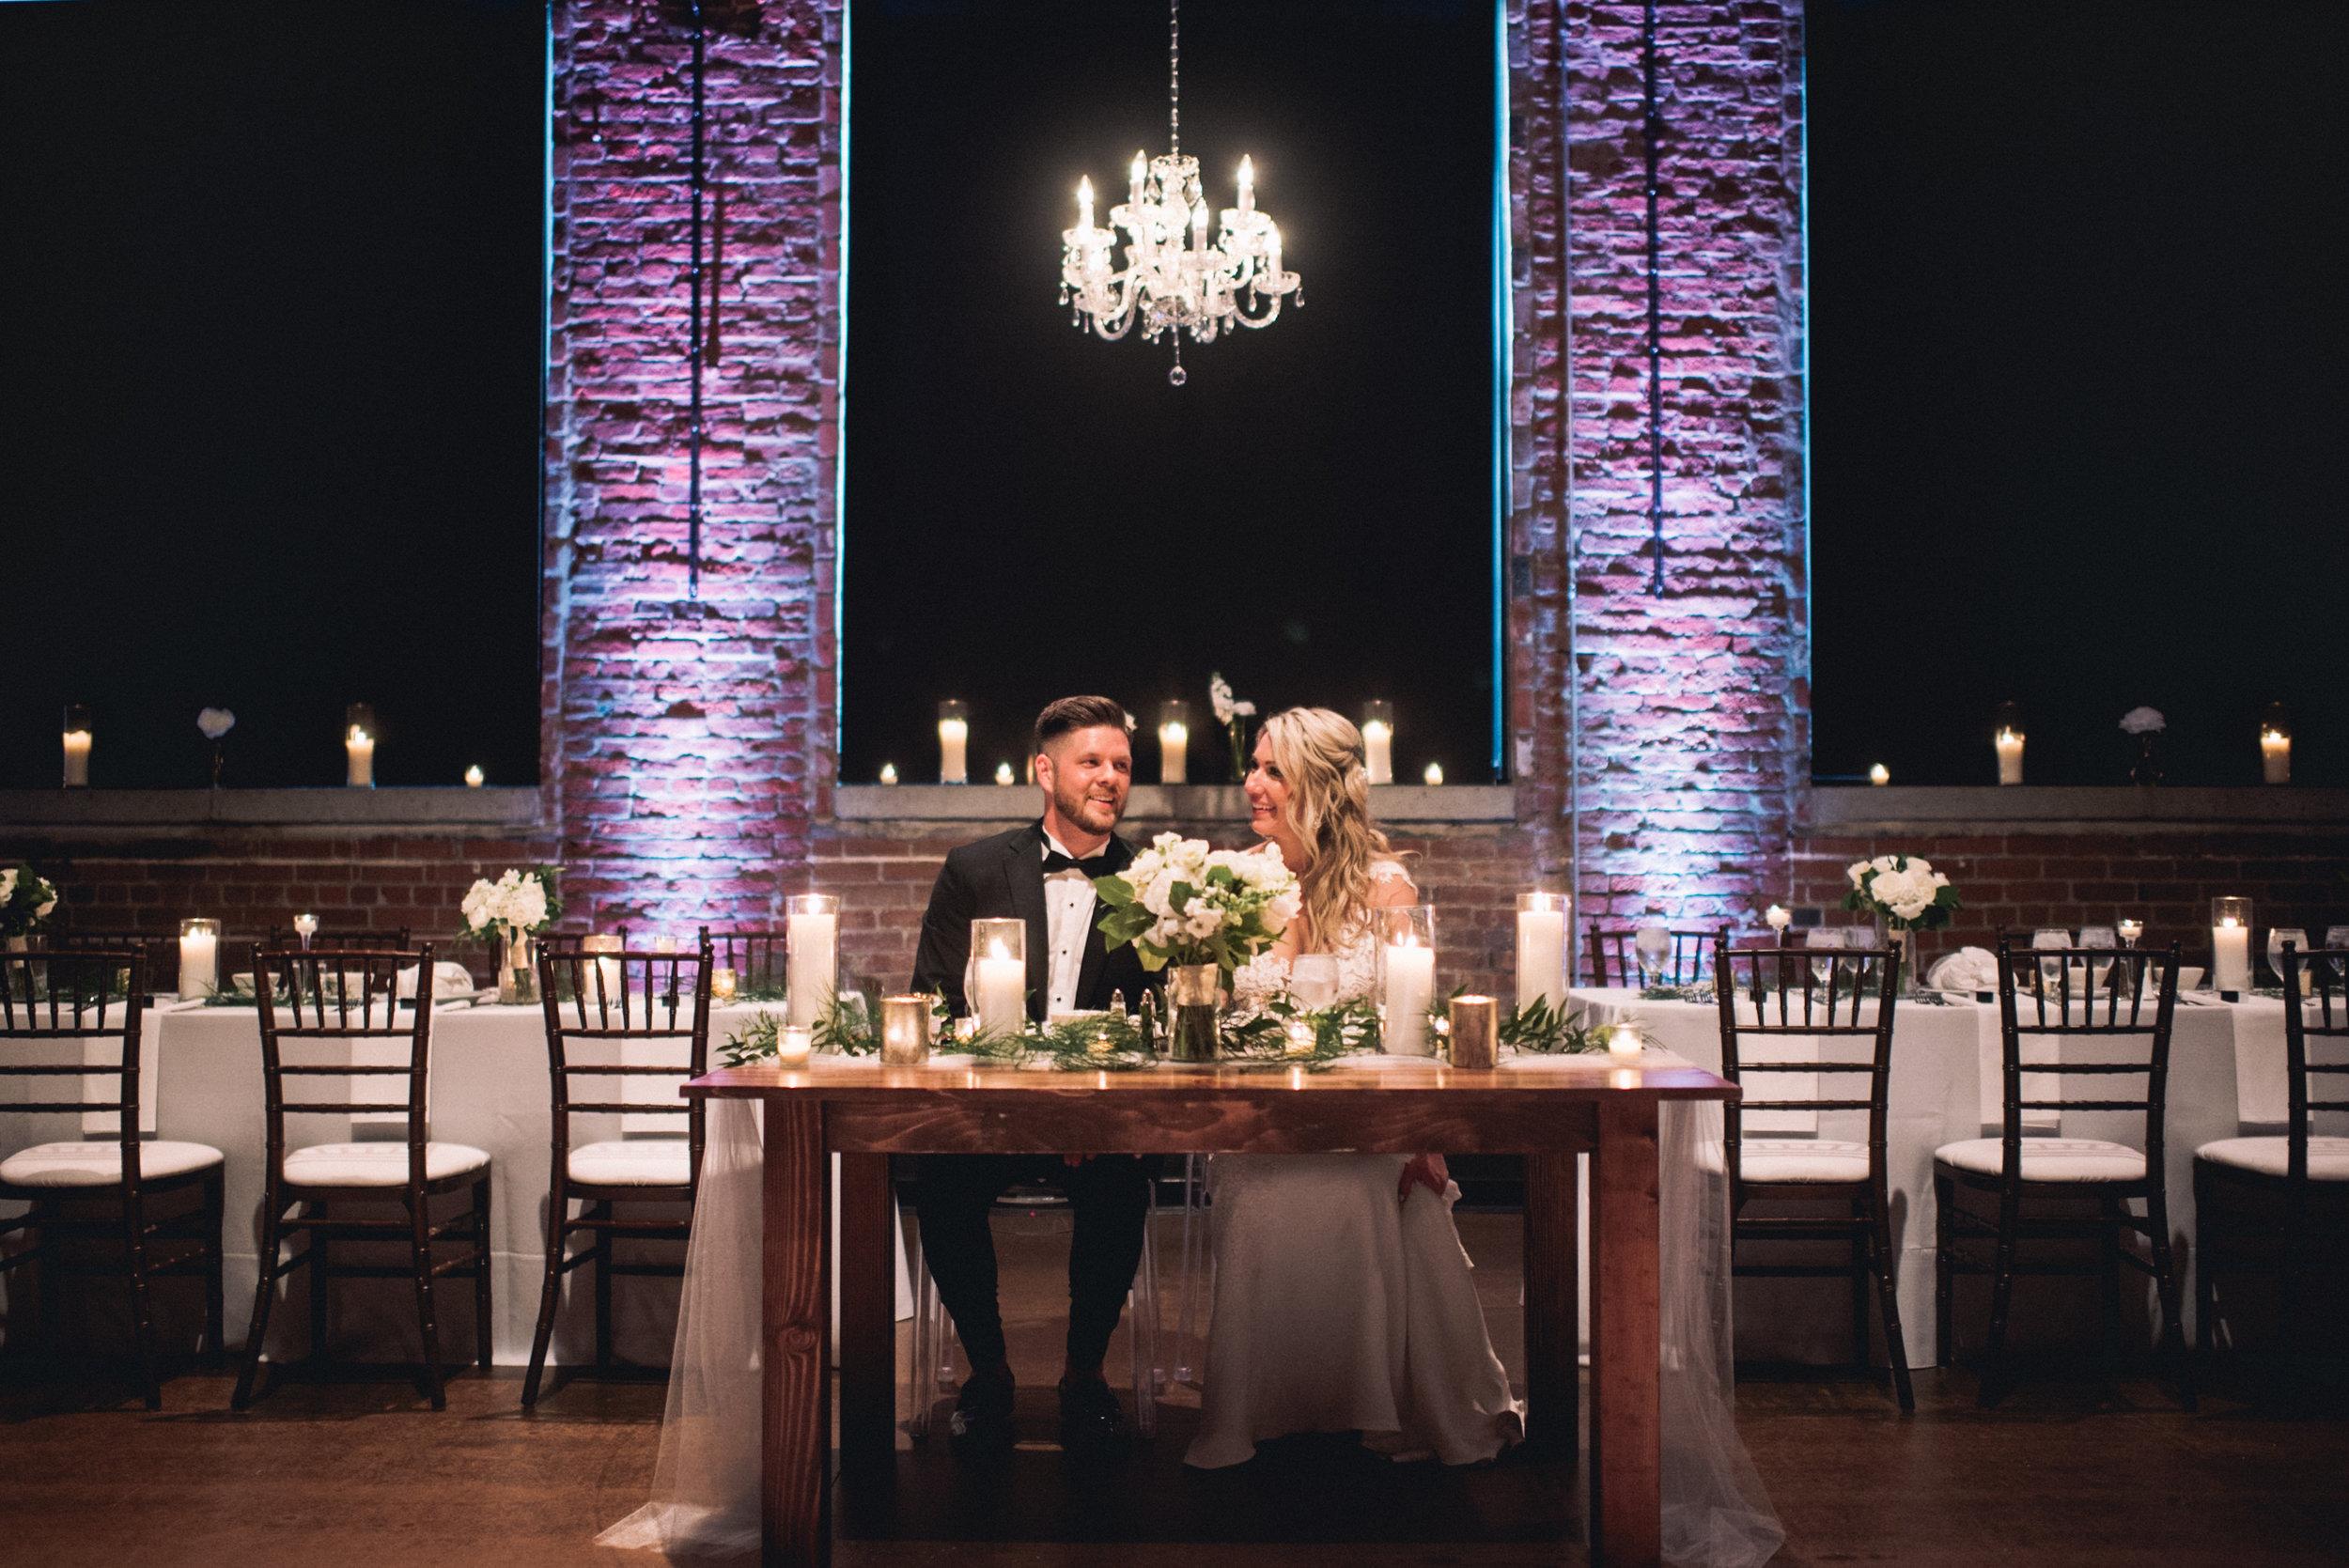 Pittsburgh Pennsylvania New York NYC Wedding Photographer Photojournalist Luxury Downtown Opera - Stirpe 1214.jpg